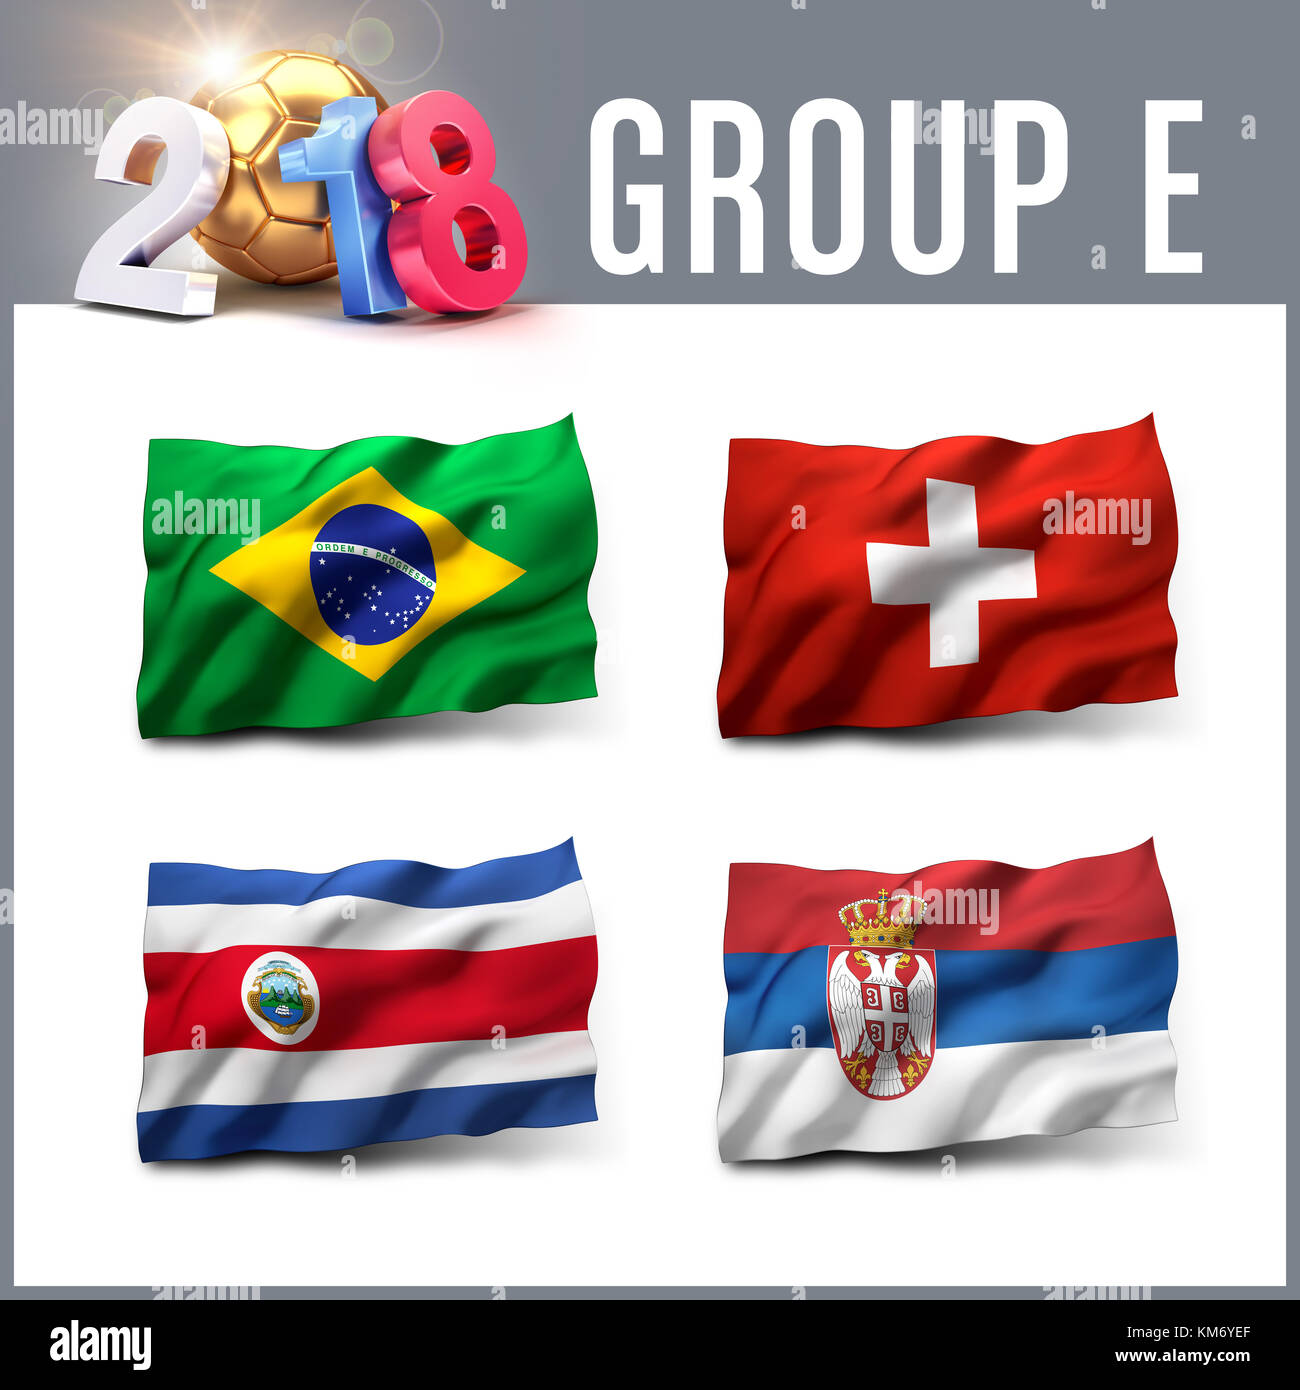 Rusia 2018 grupo de clasificación E con banderas del equipo. Competición internacional de fútbol. Imagen De Stock